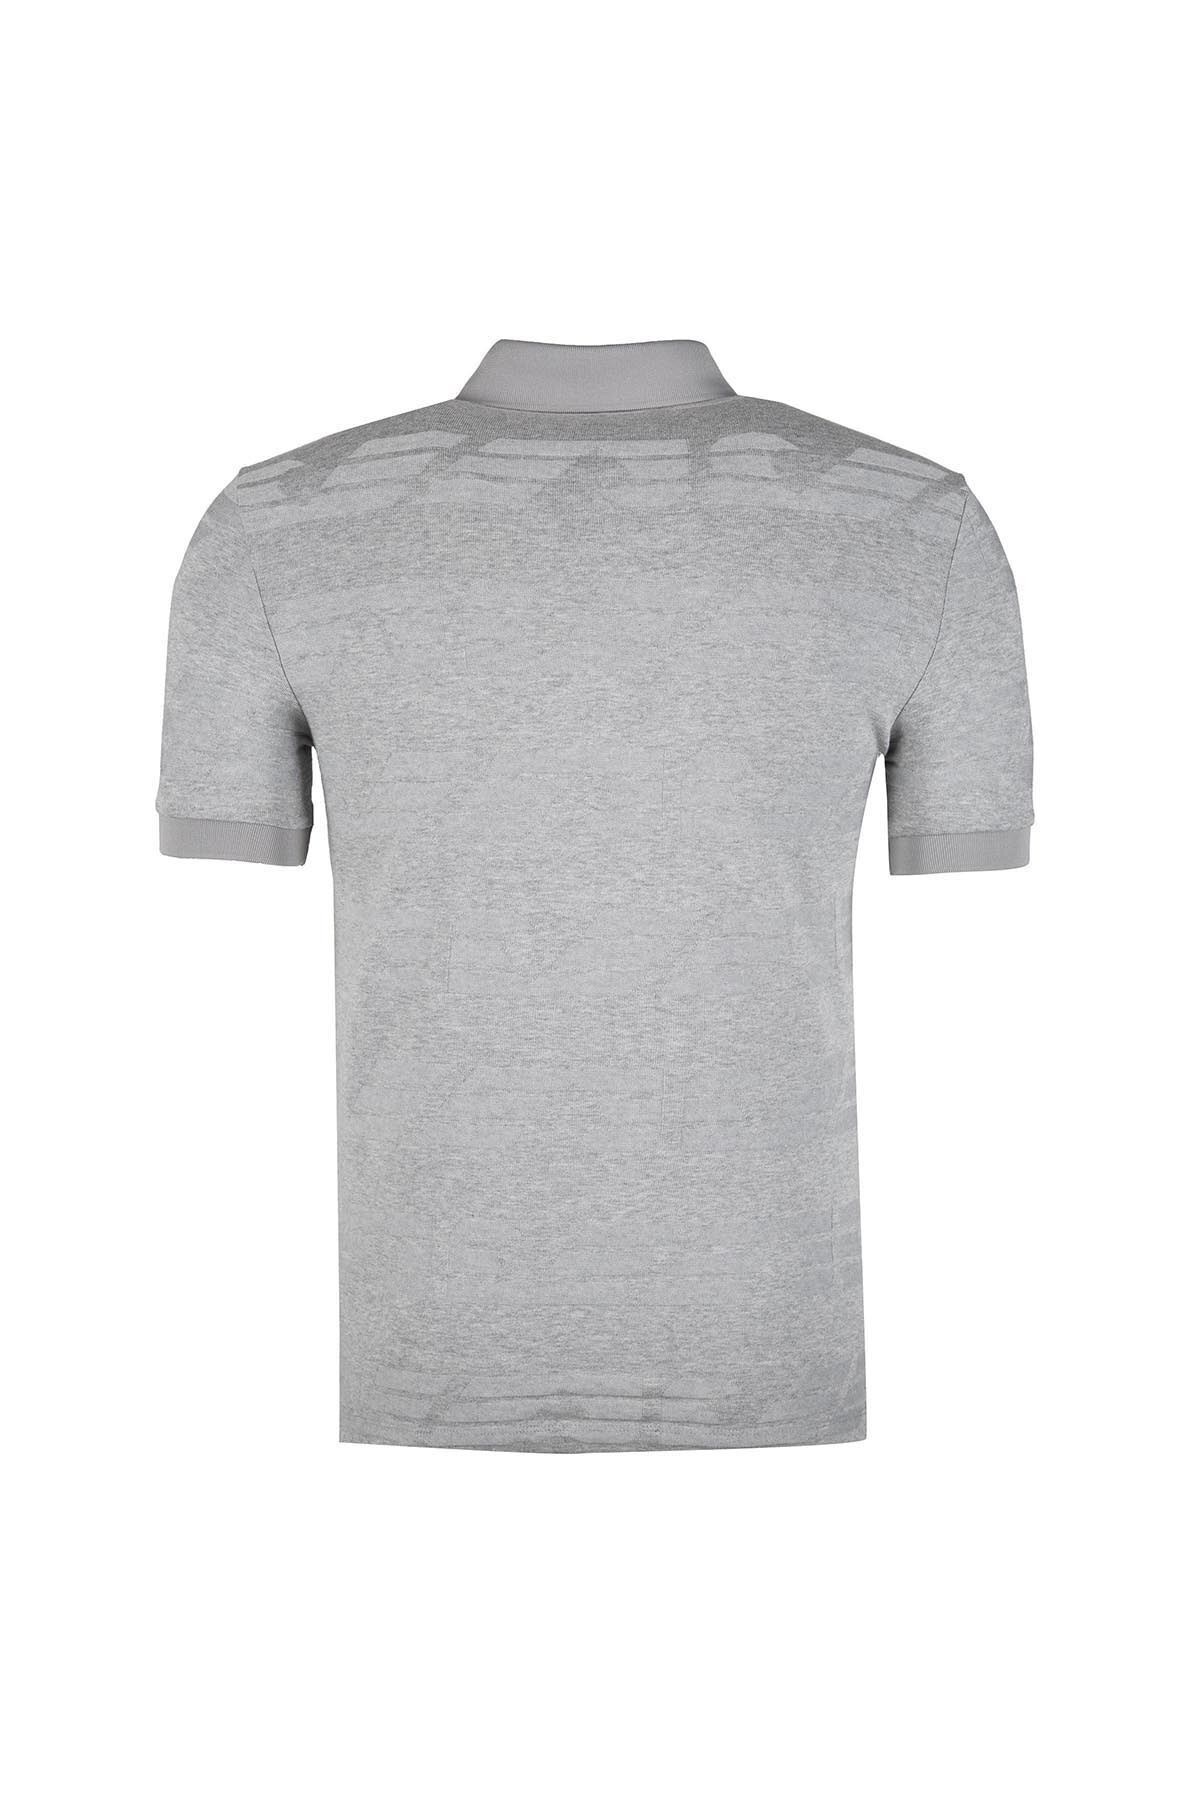 EMPORIO ARMANI T SHIRT Erkek T Shirt 3Z1F64 1JSXZ F606 GRİ